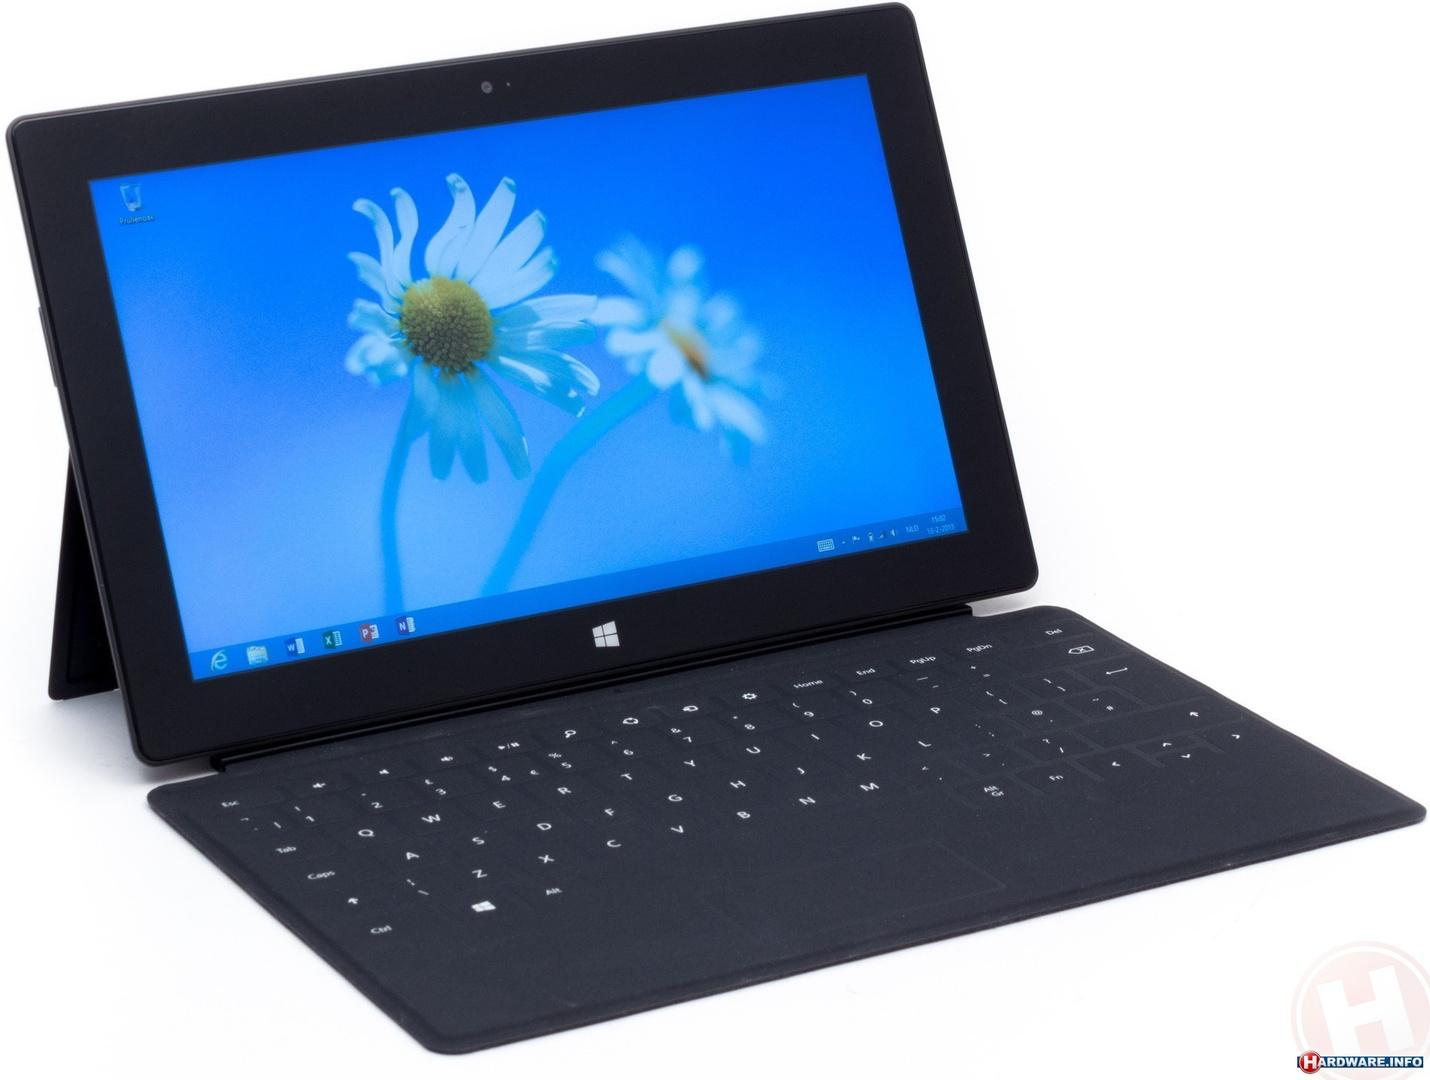 HWI Tijdmachine Week 8 Athlon Laptop Met GeForce Go